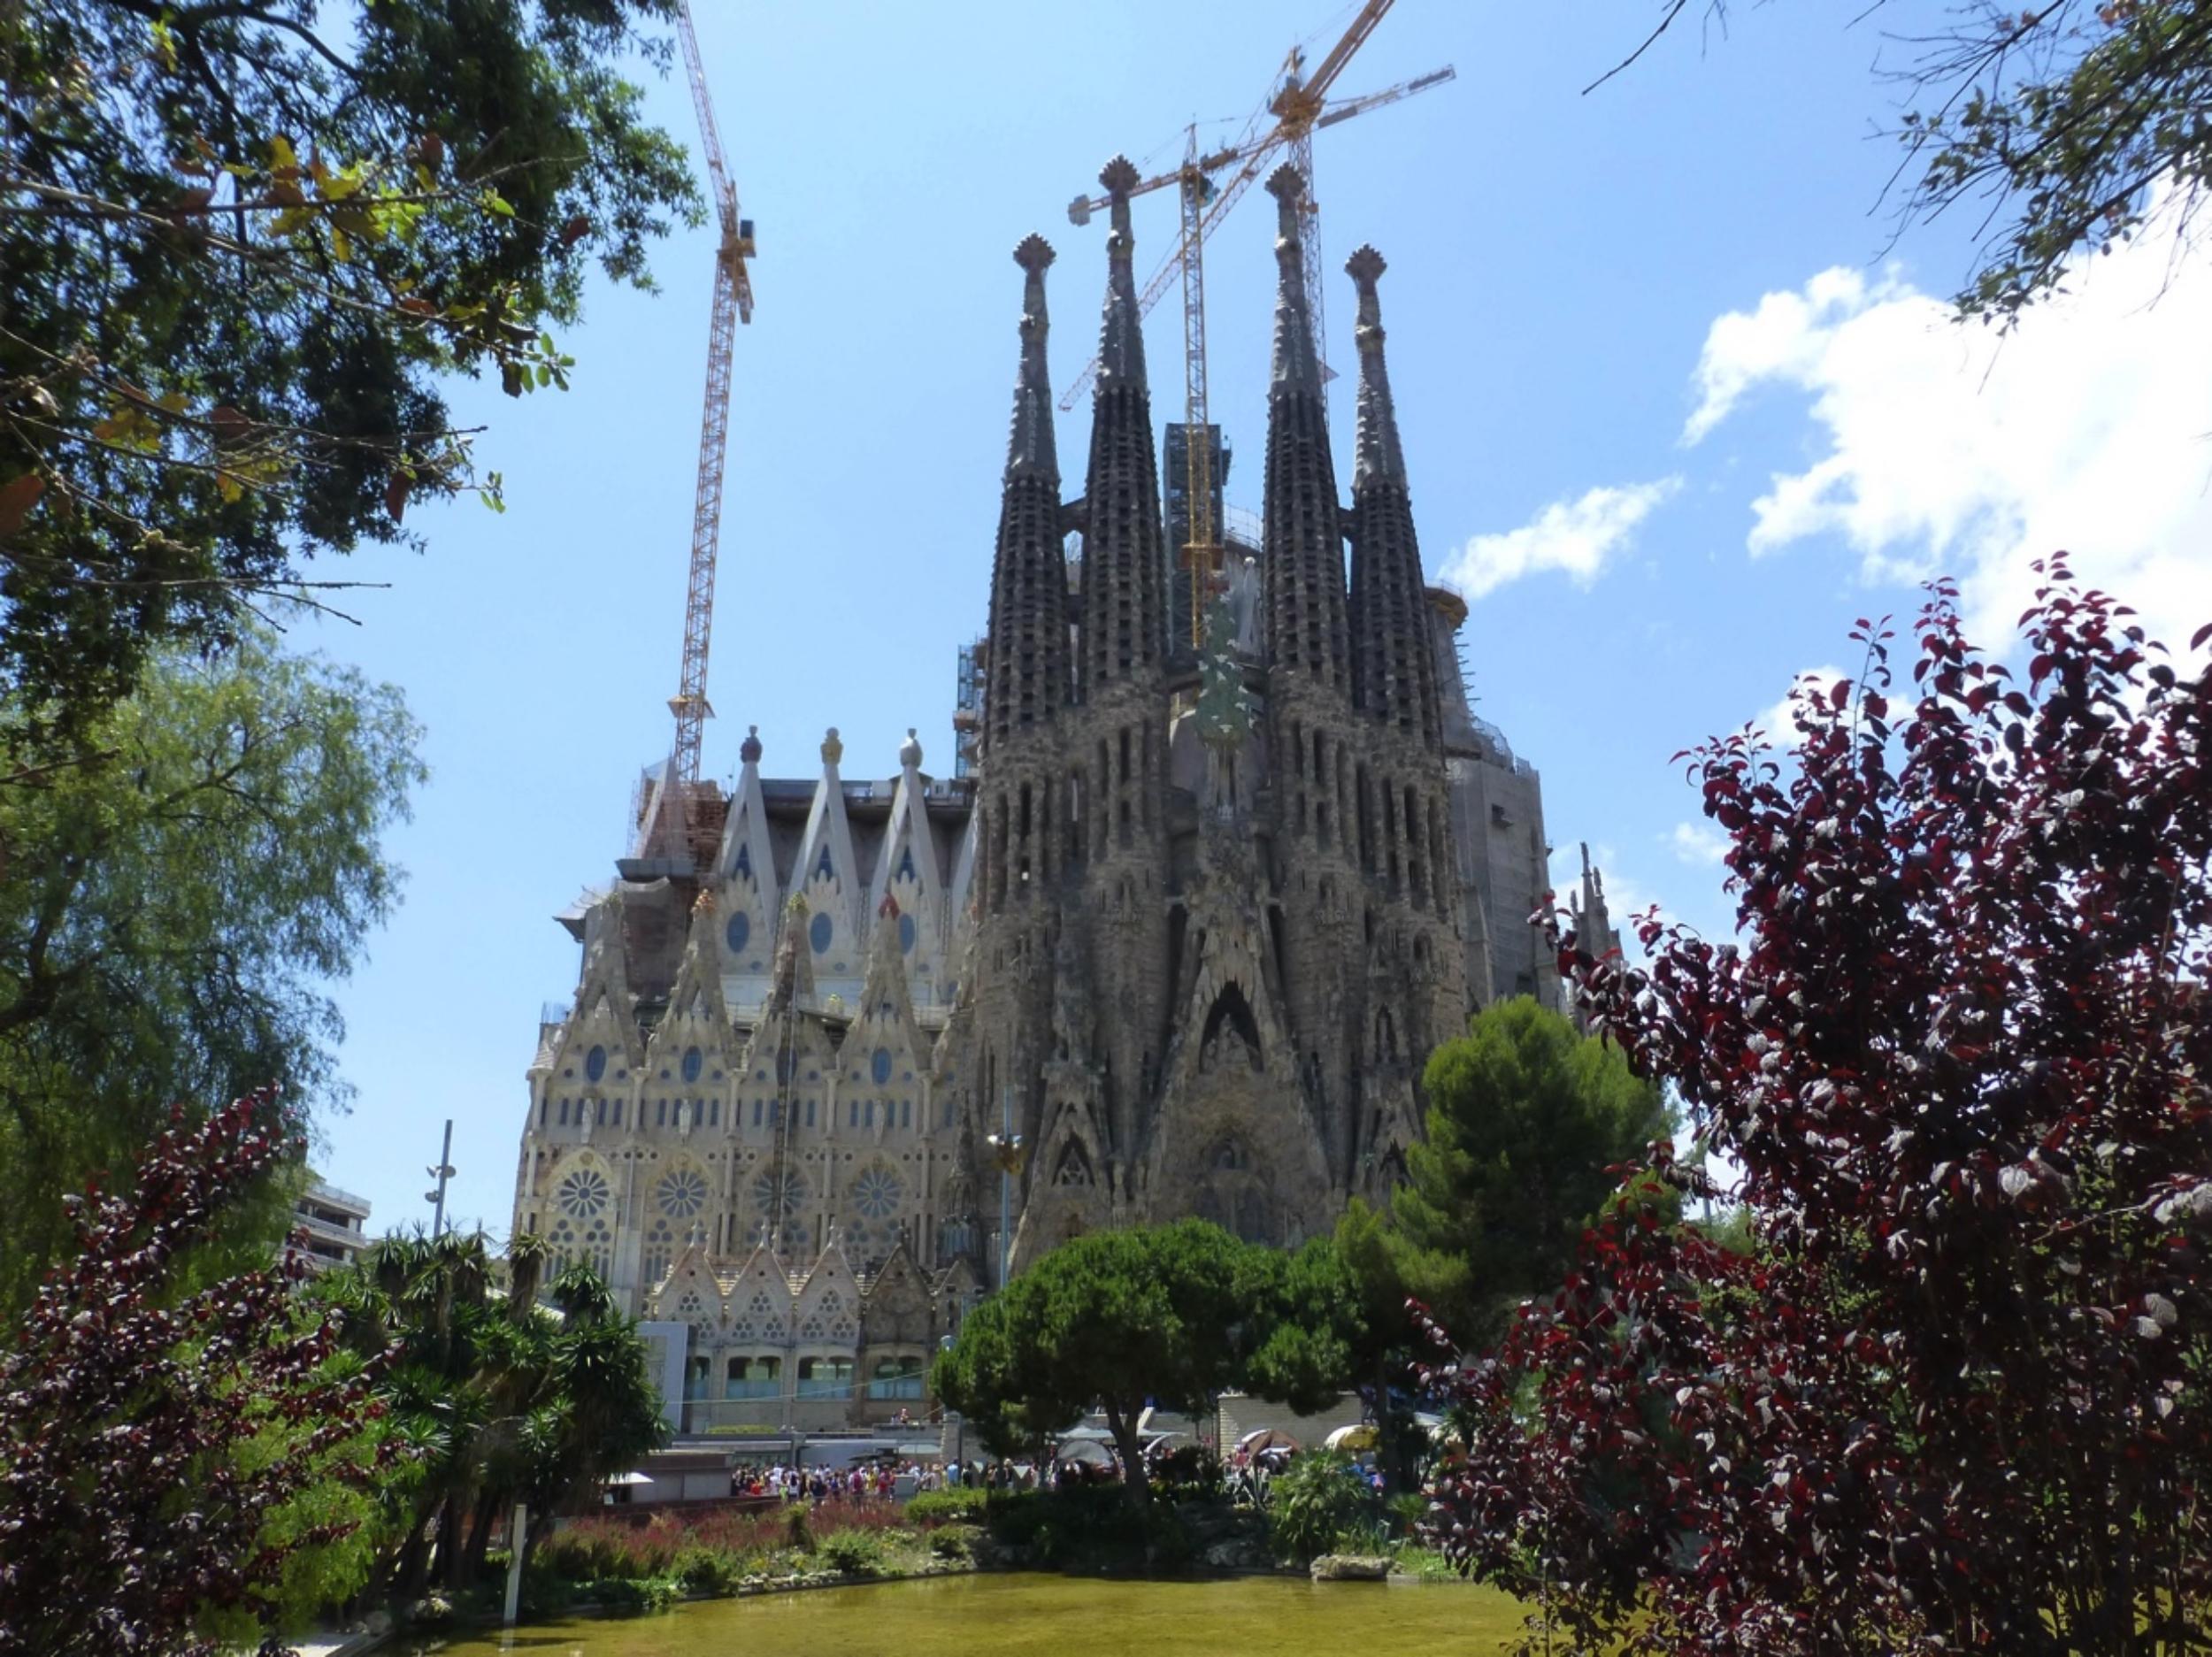 Front of the Basilica Sagrada Familia. Photo courtesy of Debra Rogers.